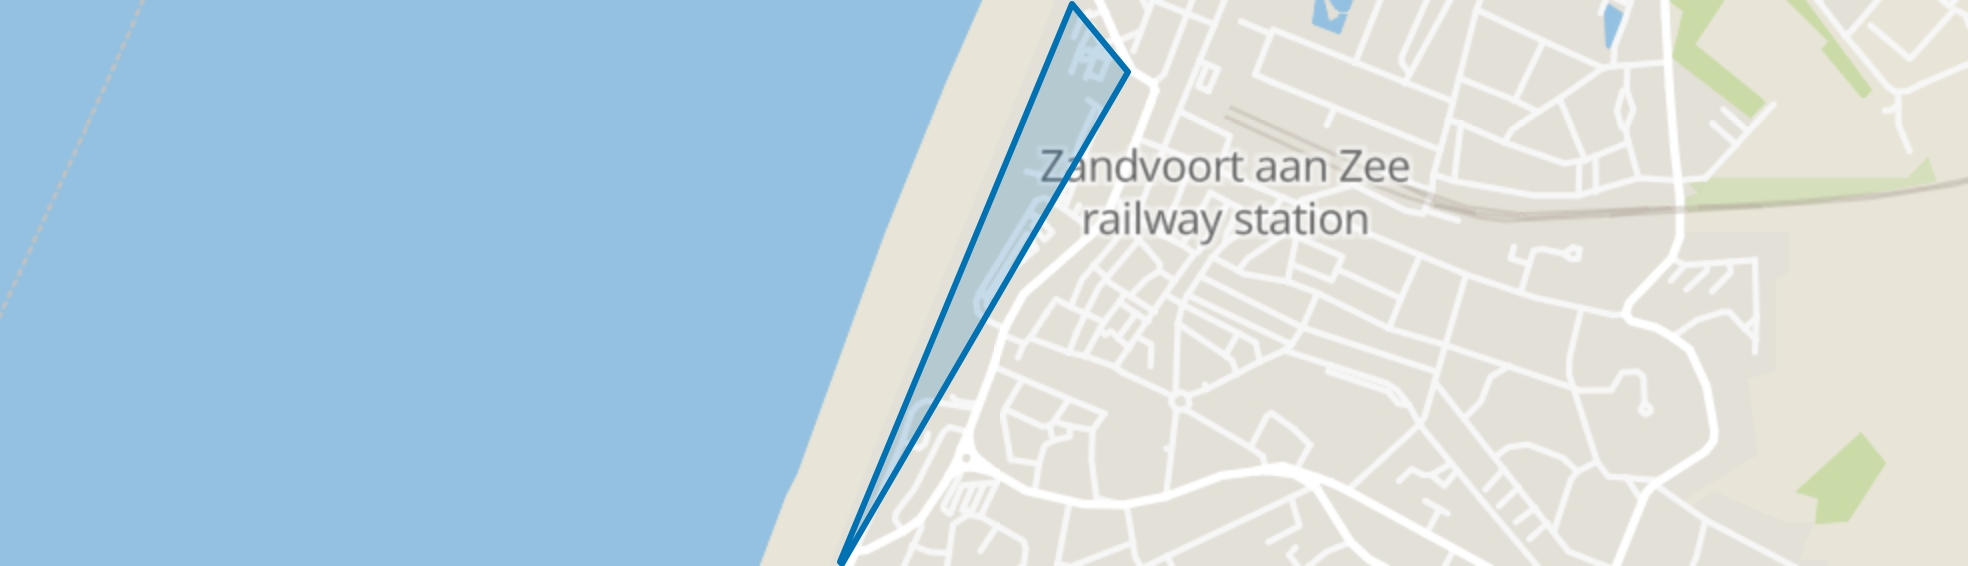 Boulevard Midden, Zandvoort map